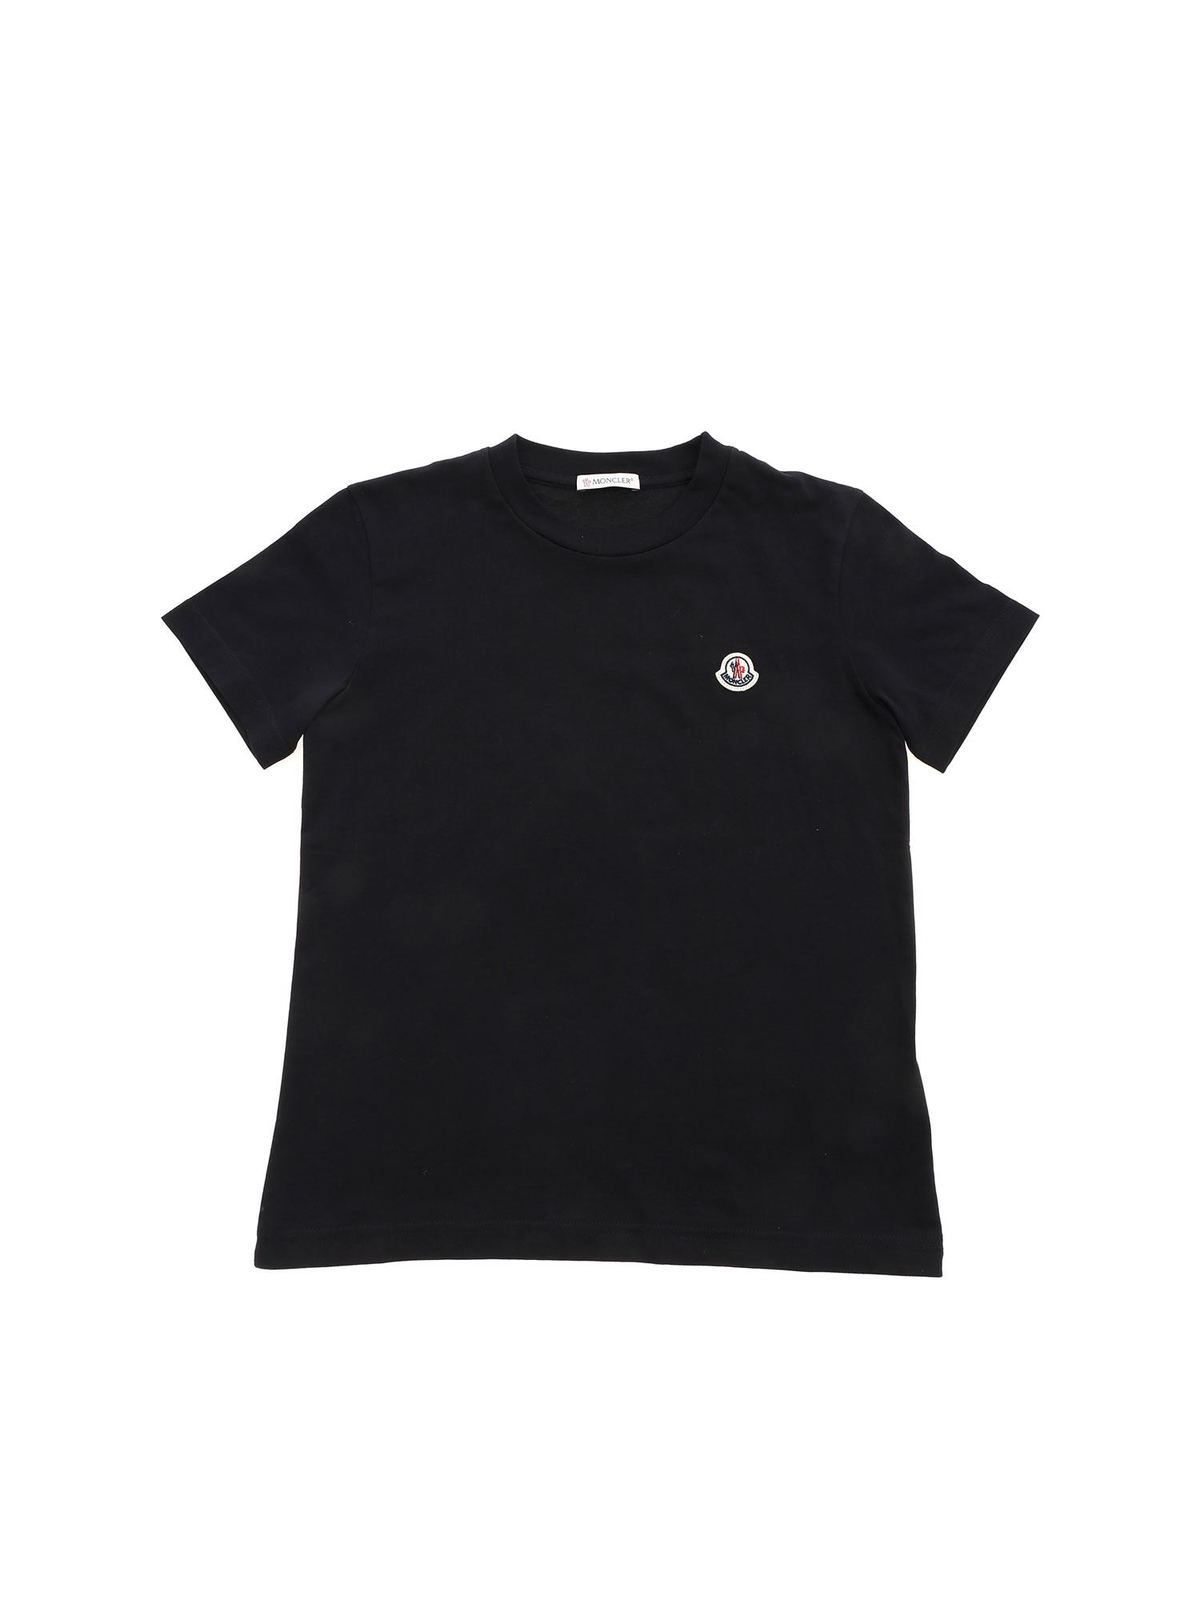 MONCLER JR LOGO PATCH T-SHIRT IN BLACK